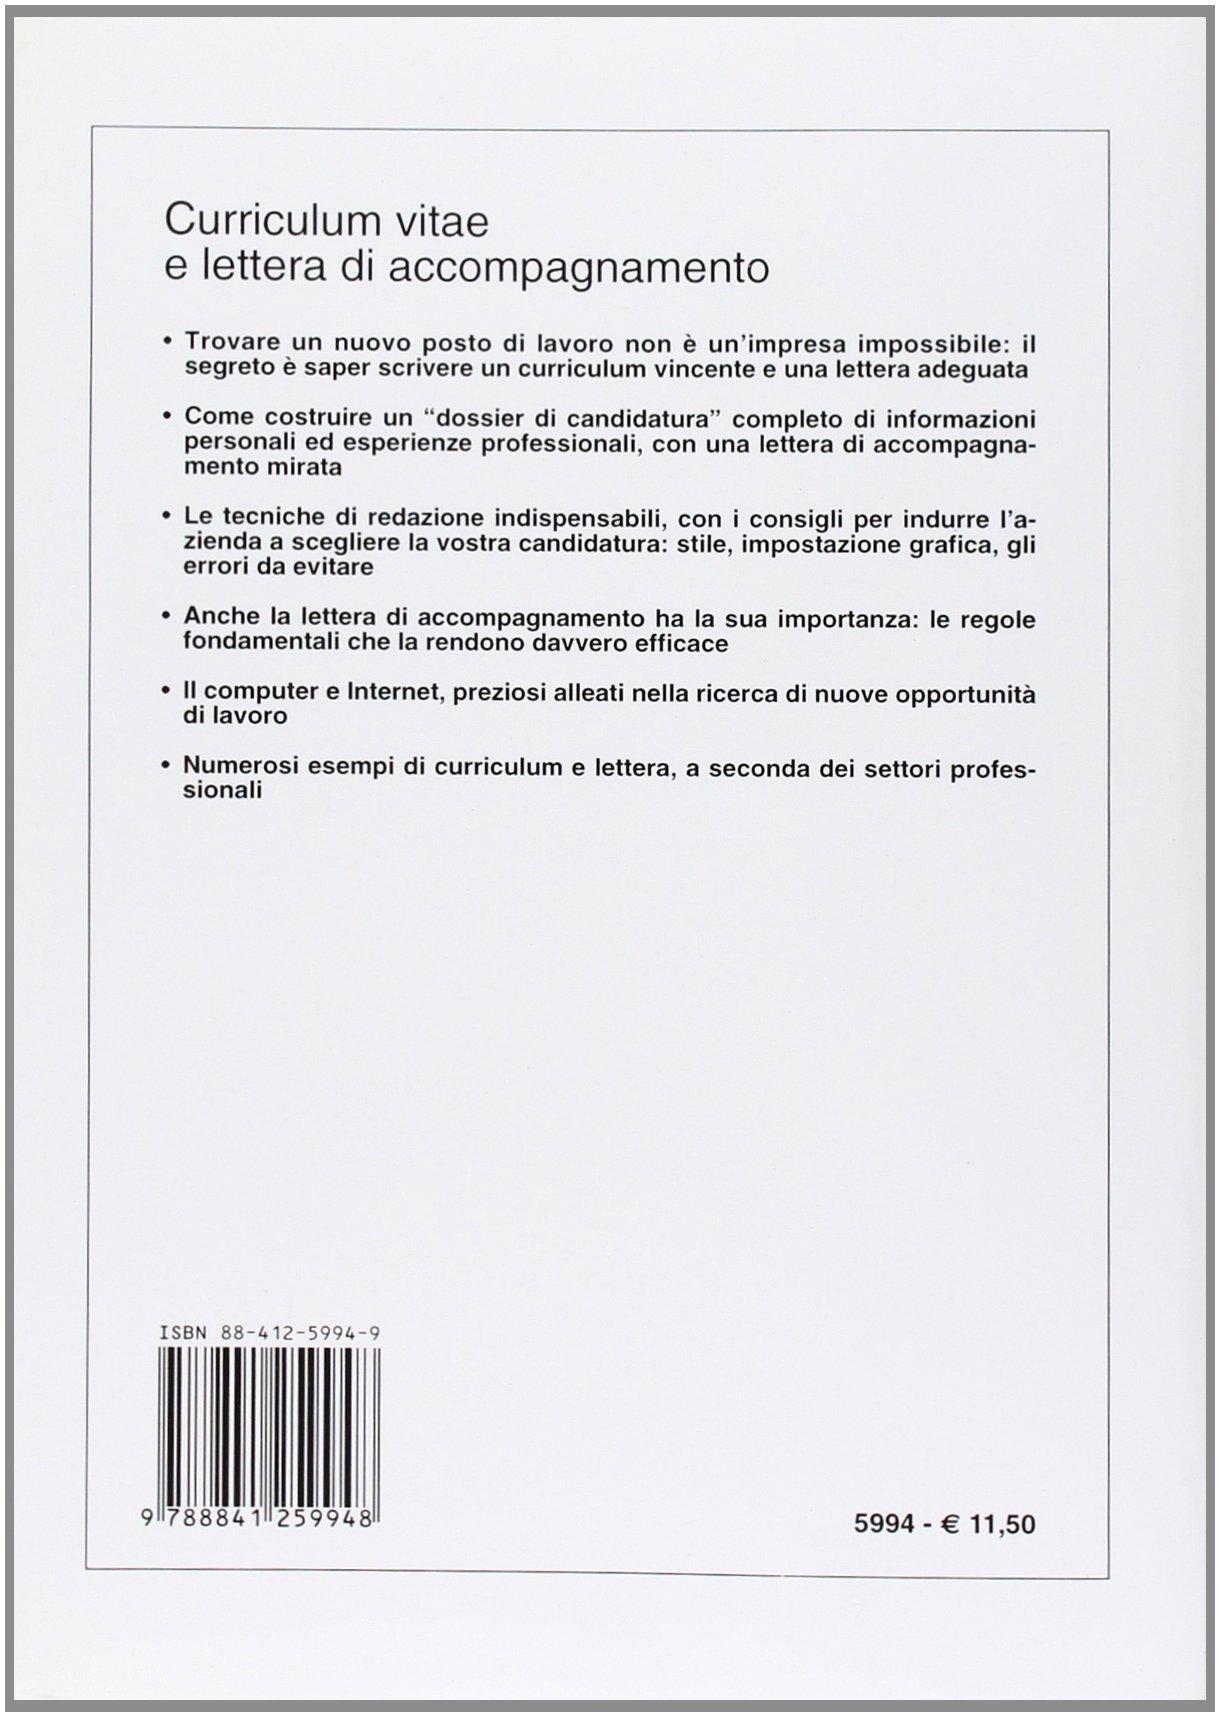 Curriculum Vitae E Lettera Di Accompagnamento Amazon Co Uk